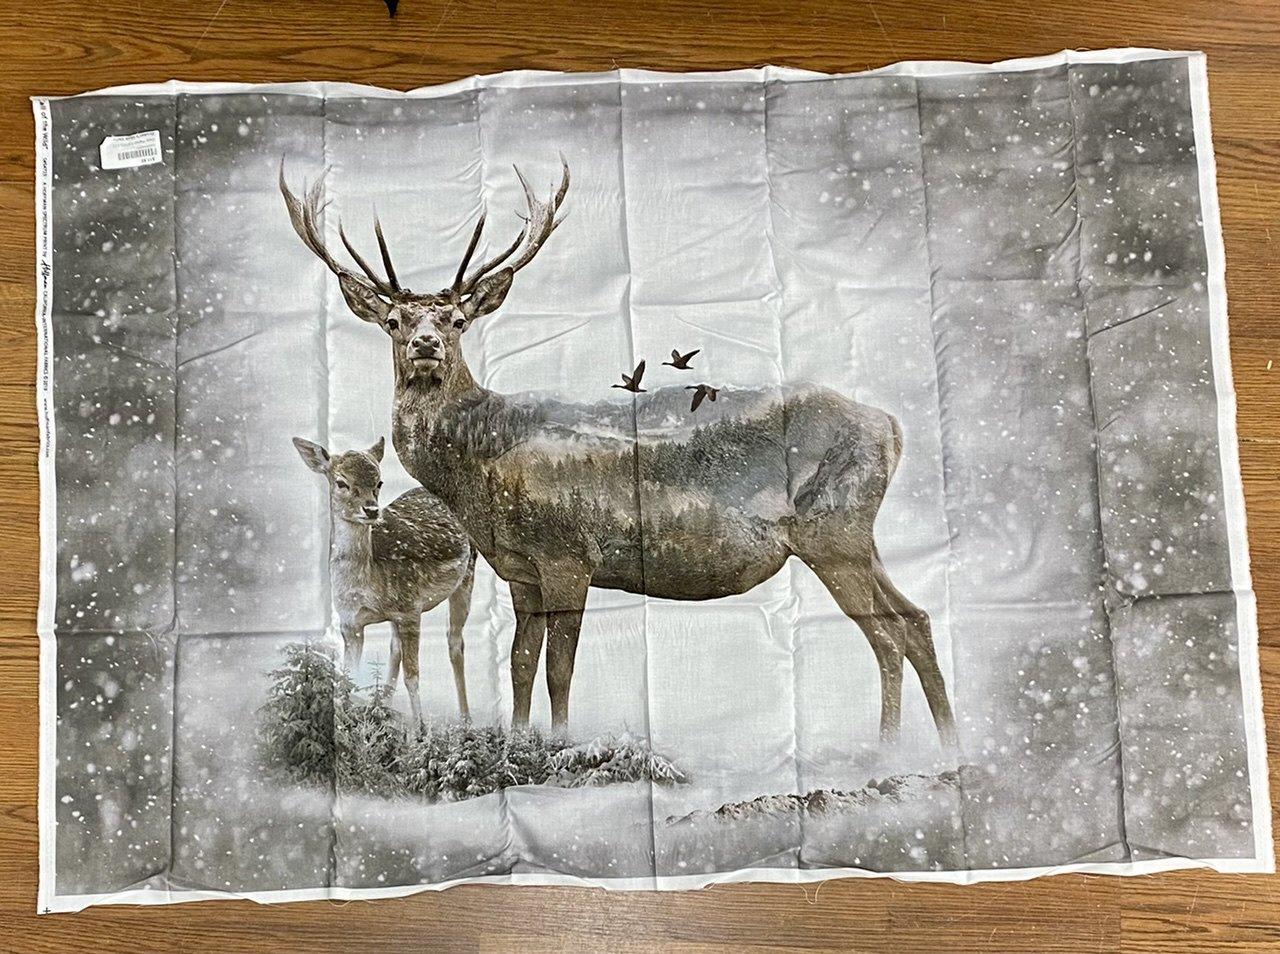 Deer Panel S4723-112 Dawn